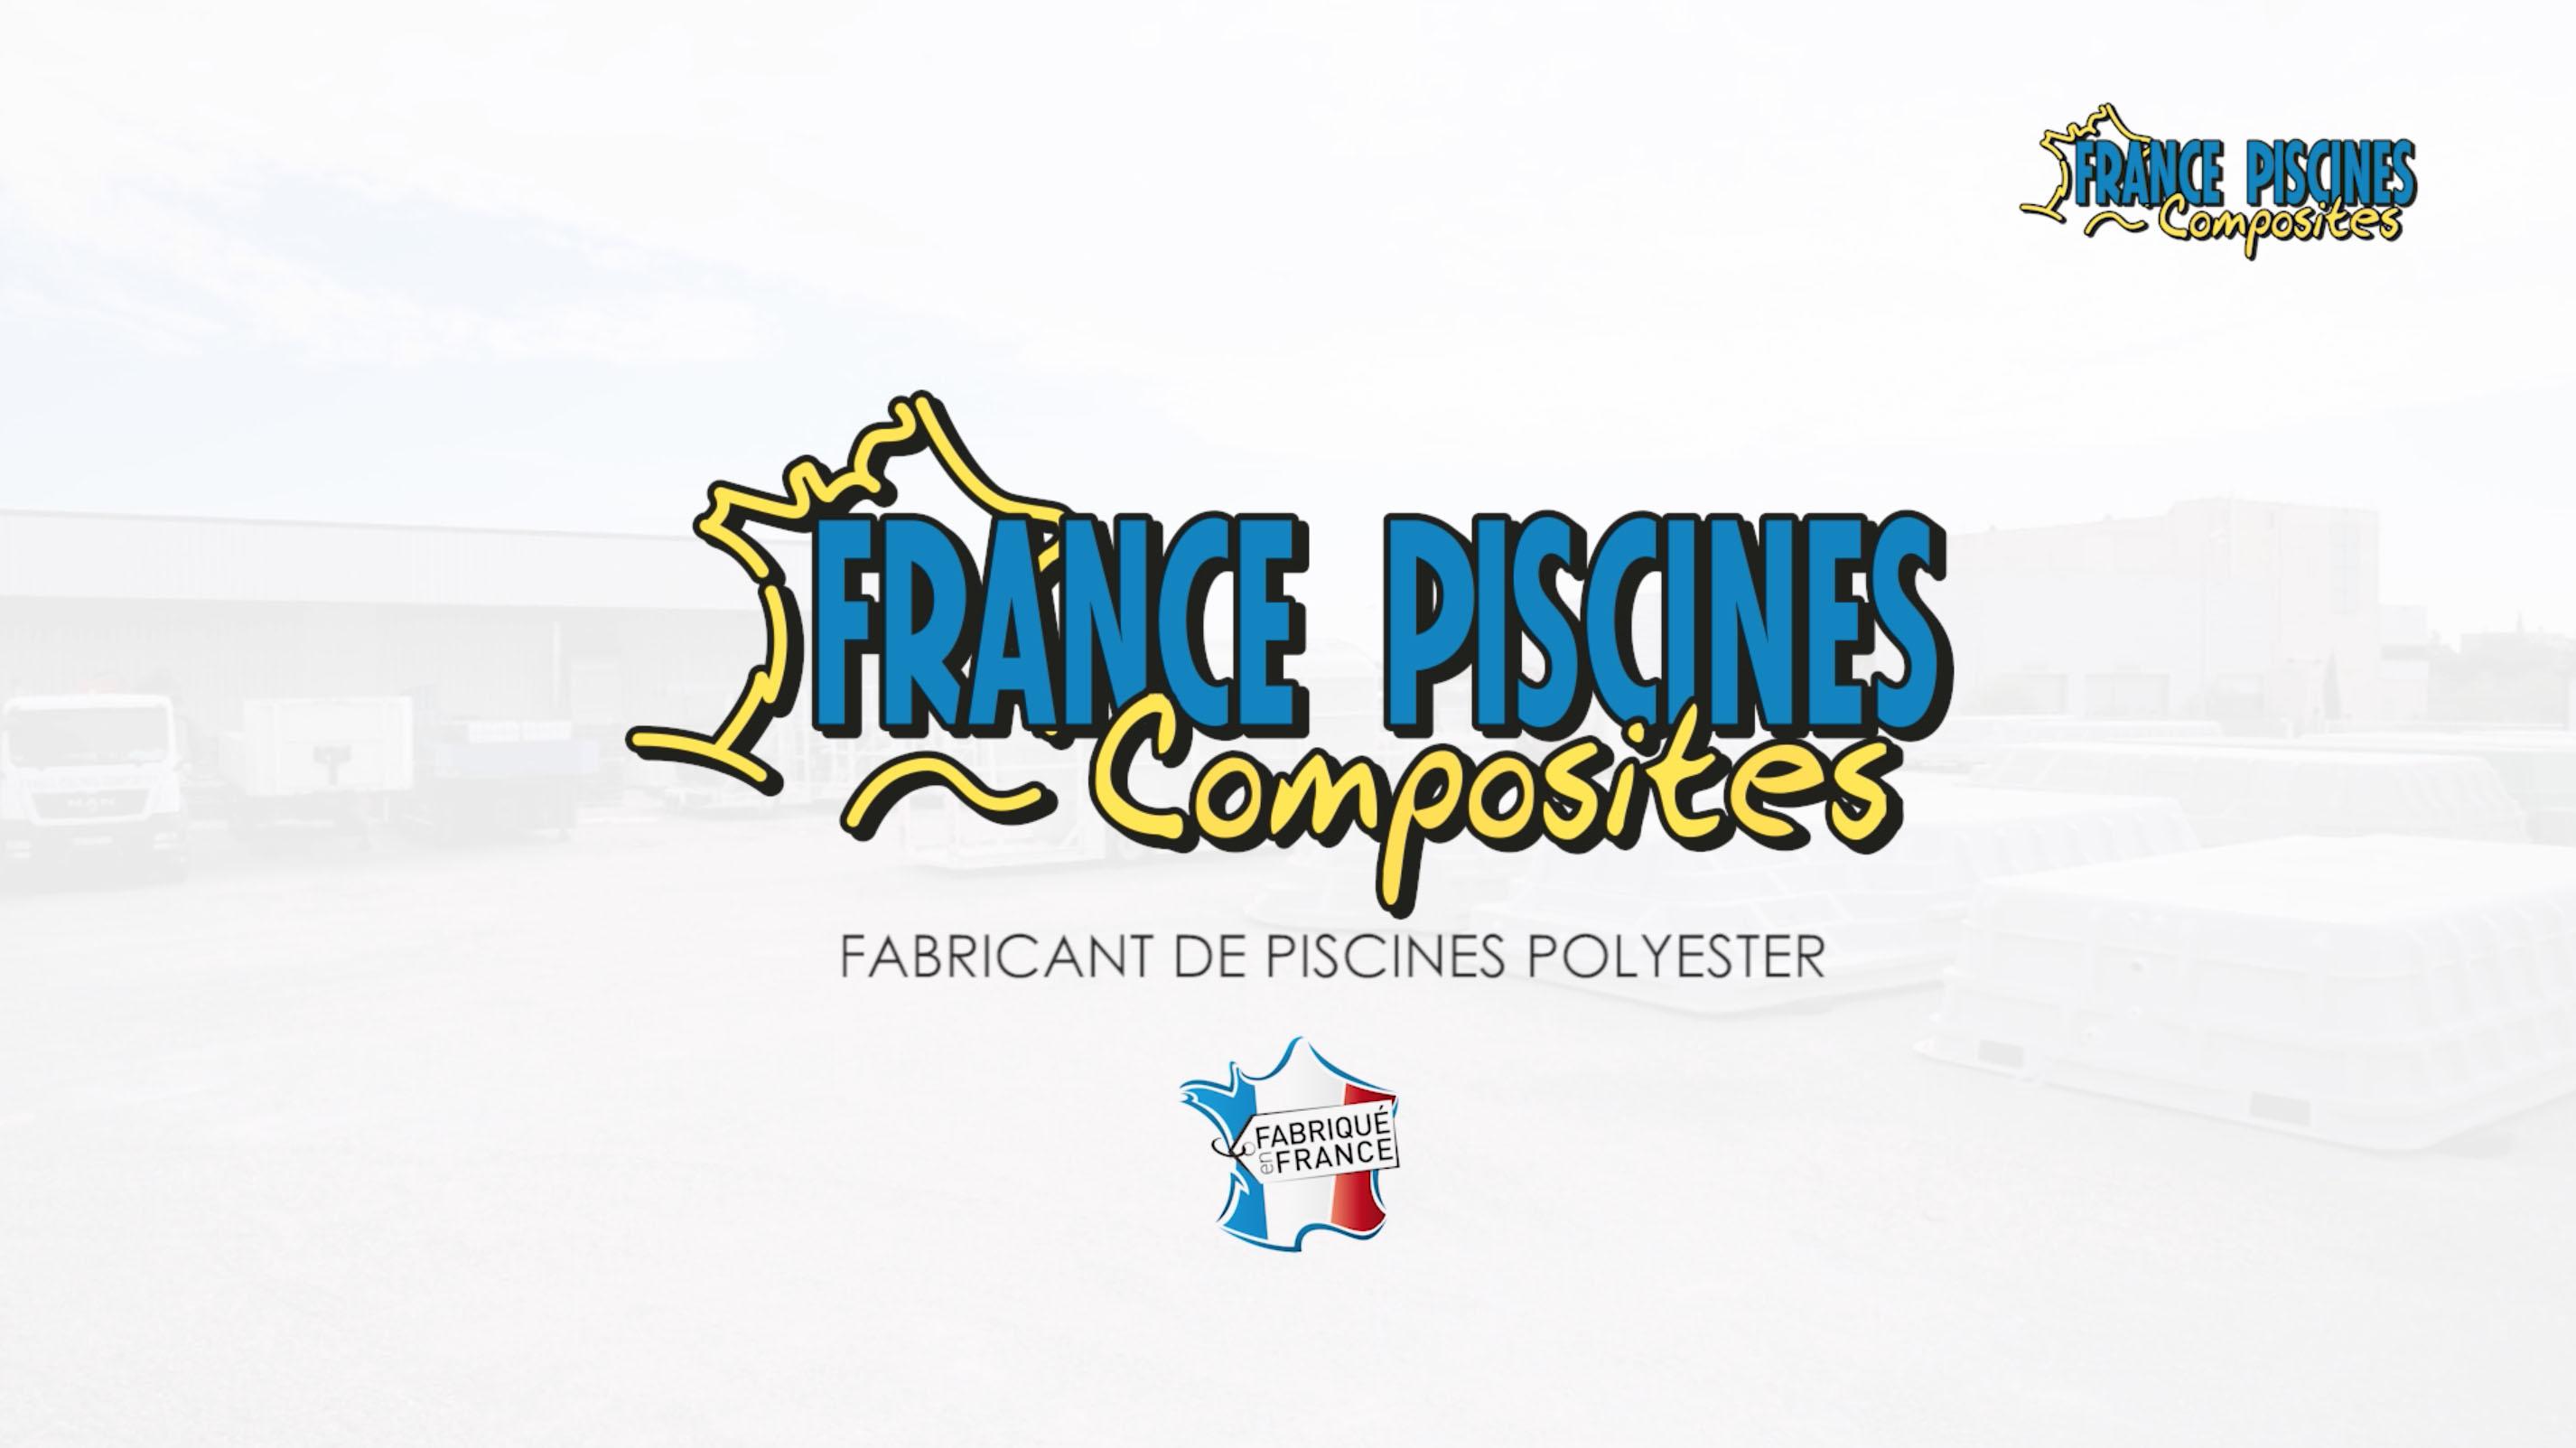 France piscines Composites – Film d'Entreprise